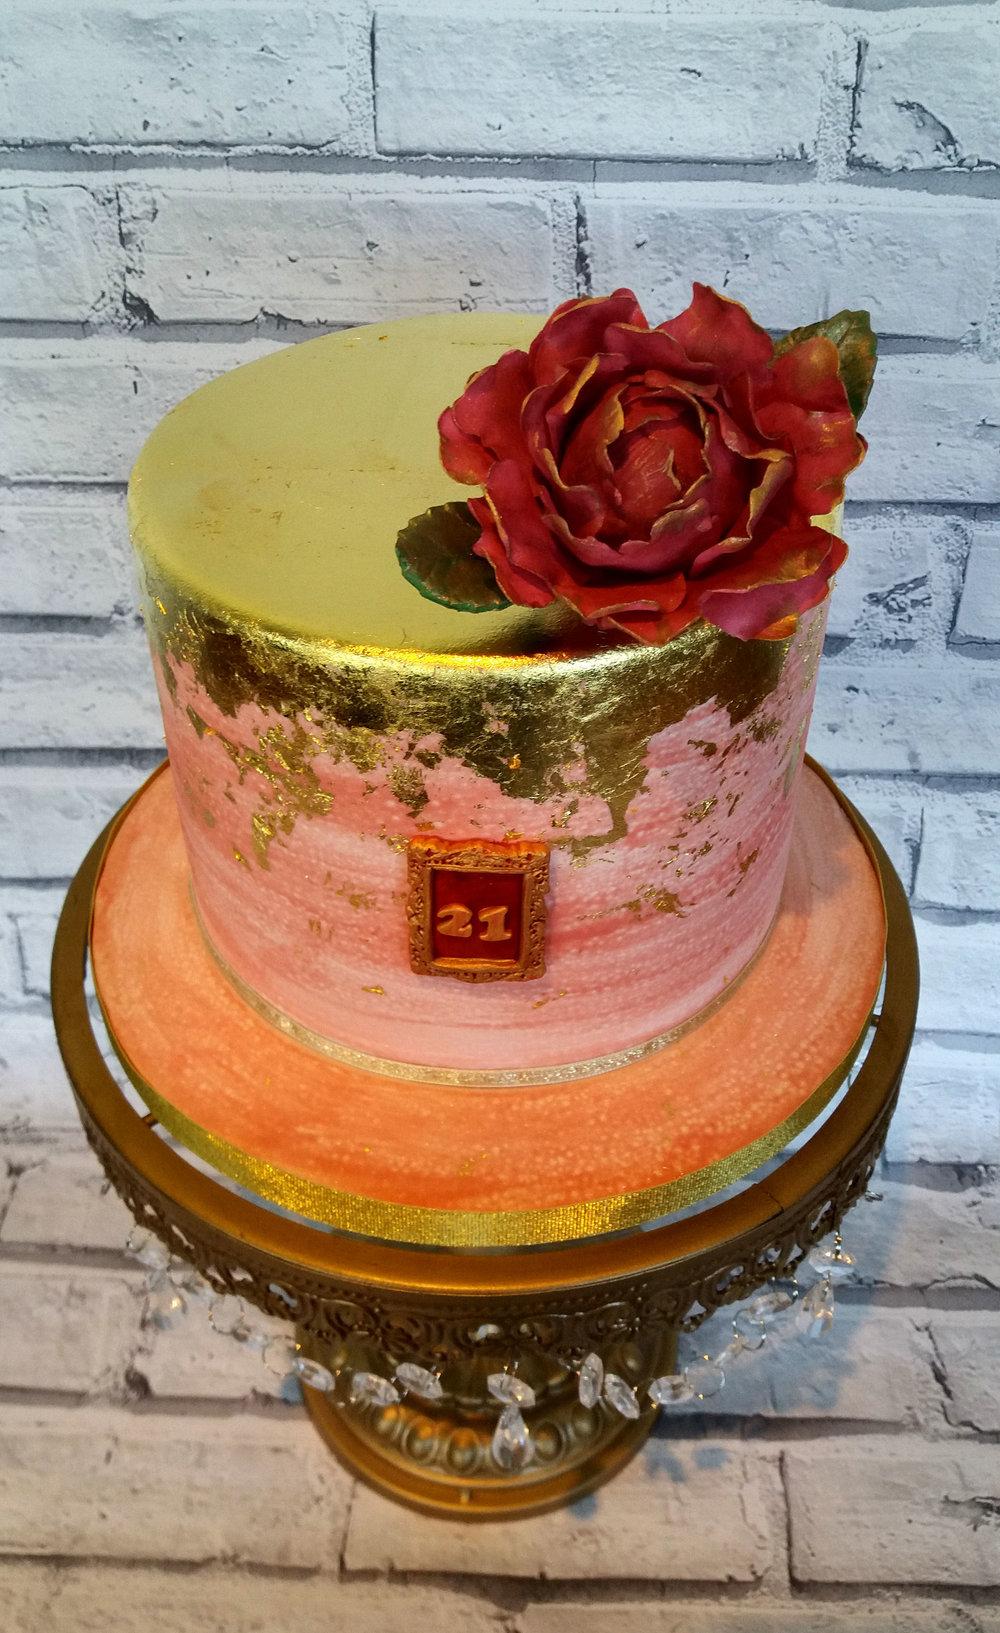 24ct gold cake 2.jpg